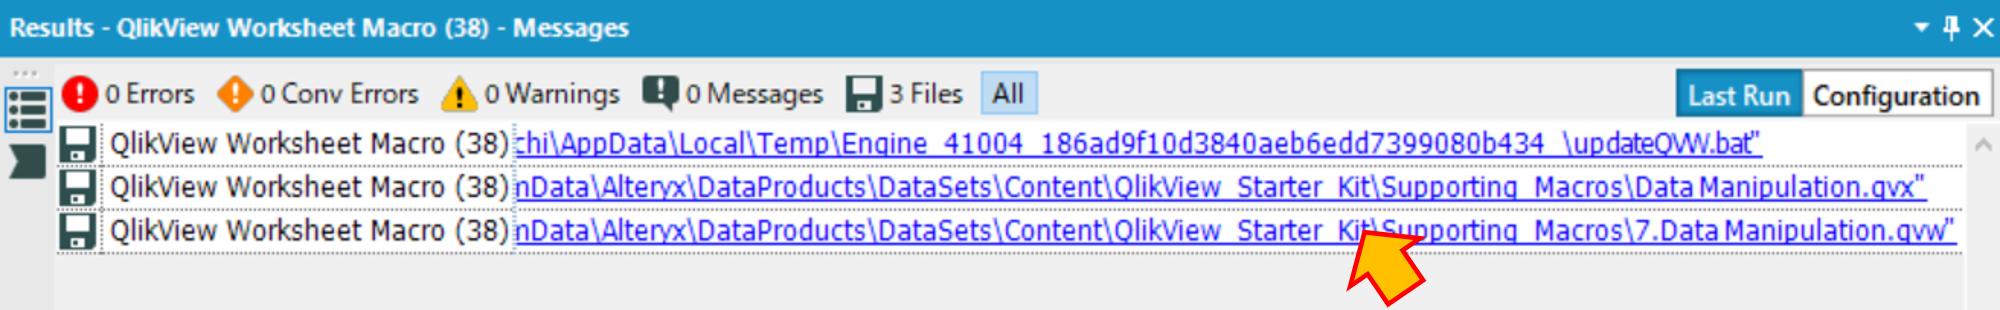 Alteryx Qlik サンプルワークフロー analytic templete starter kit Result画面